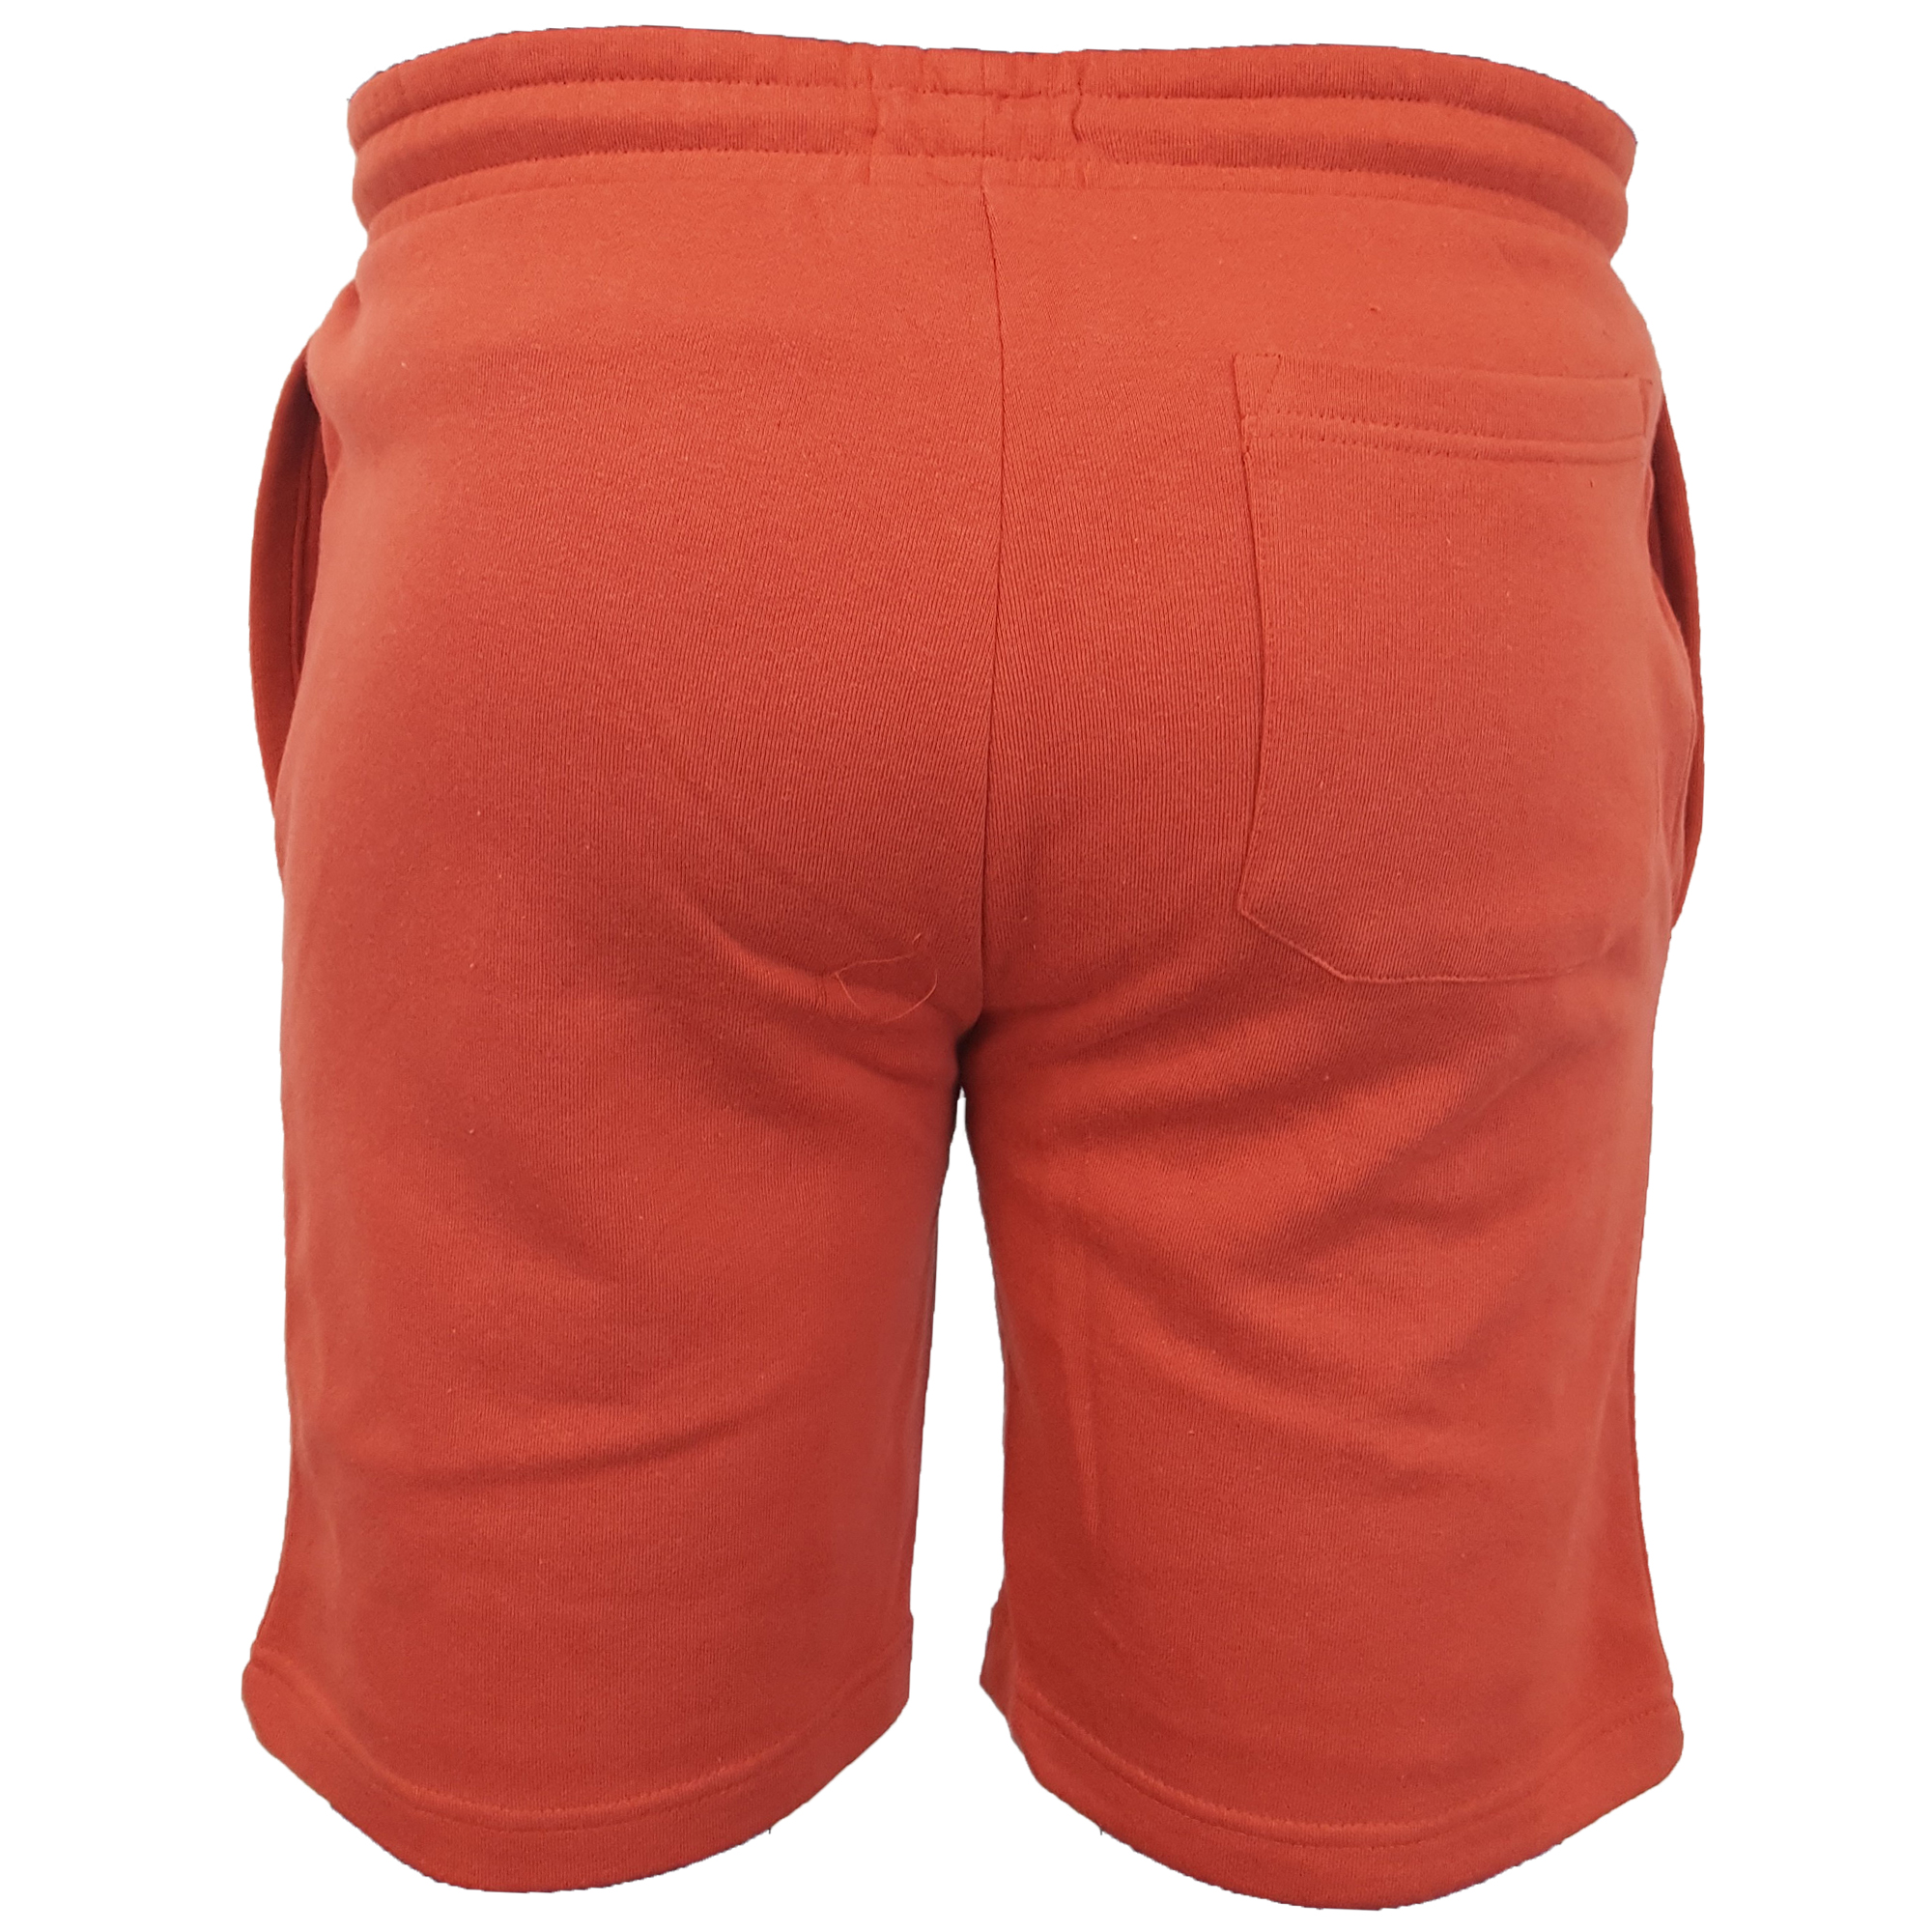 Mens-Jogger-Shorts-Tarley-by-Brave-Soul-Knee-Length-Casual-Fleece-Lined-Summer thumbnail 43